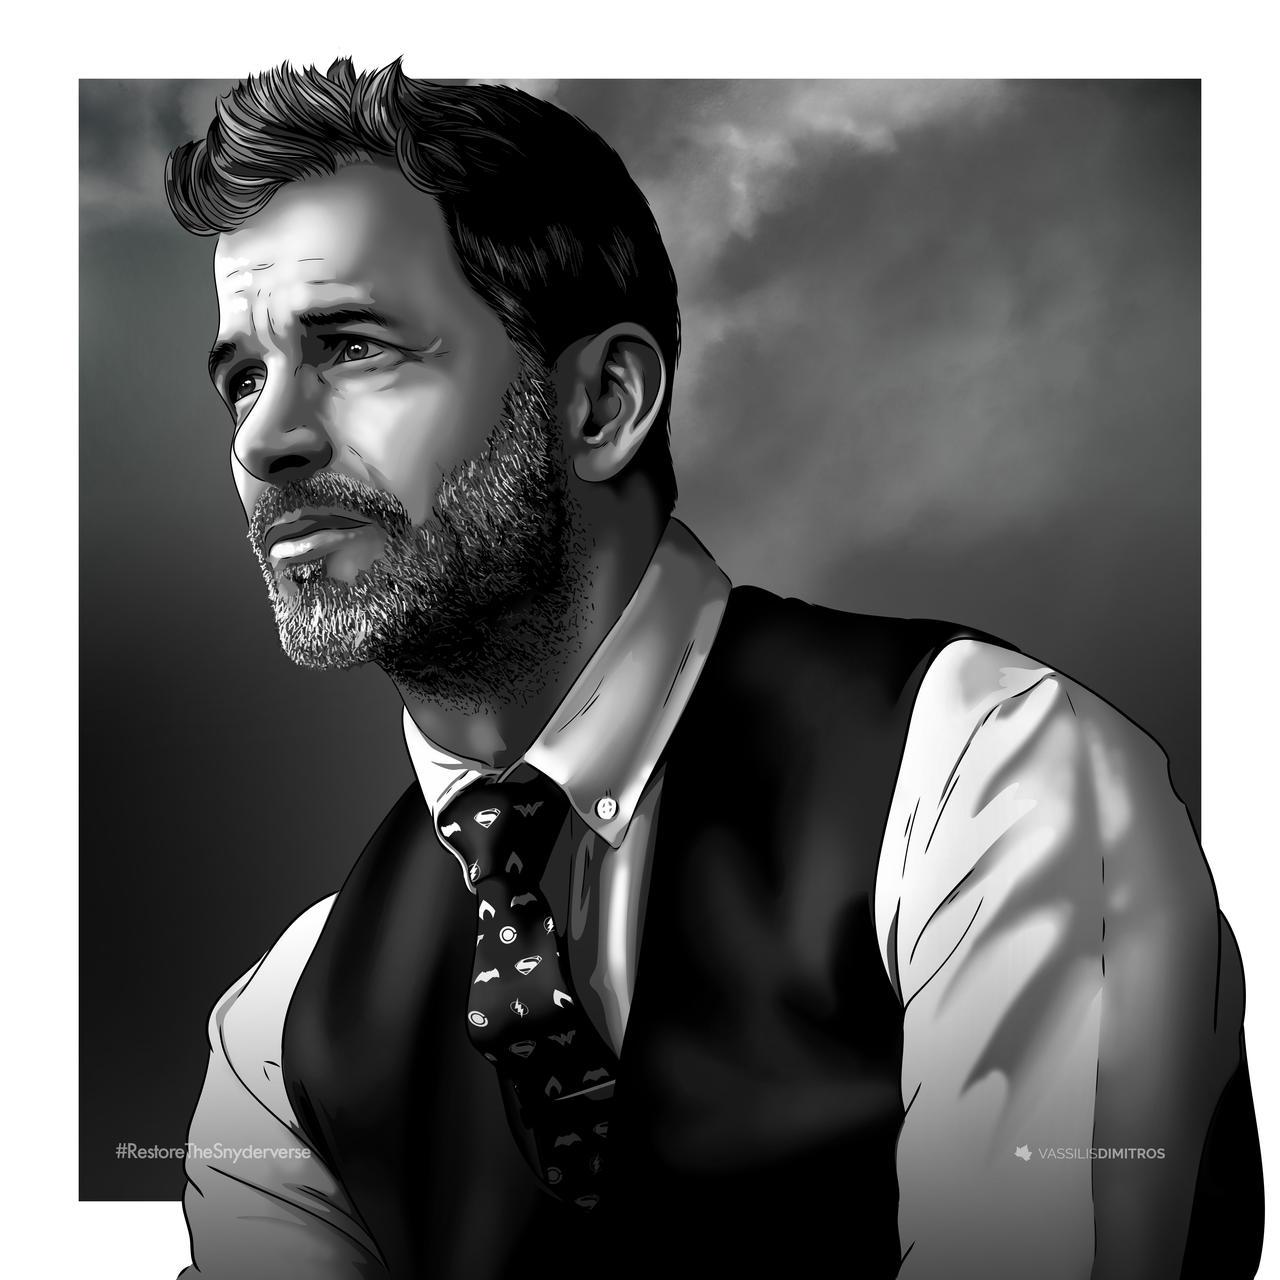 Zack Snyder's Justice League - Zack Snyder